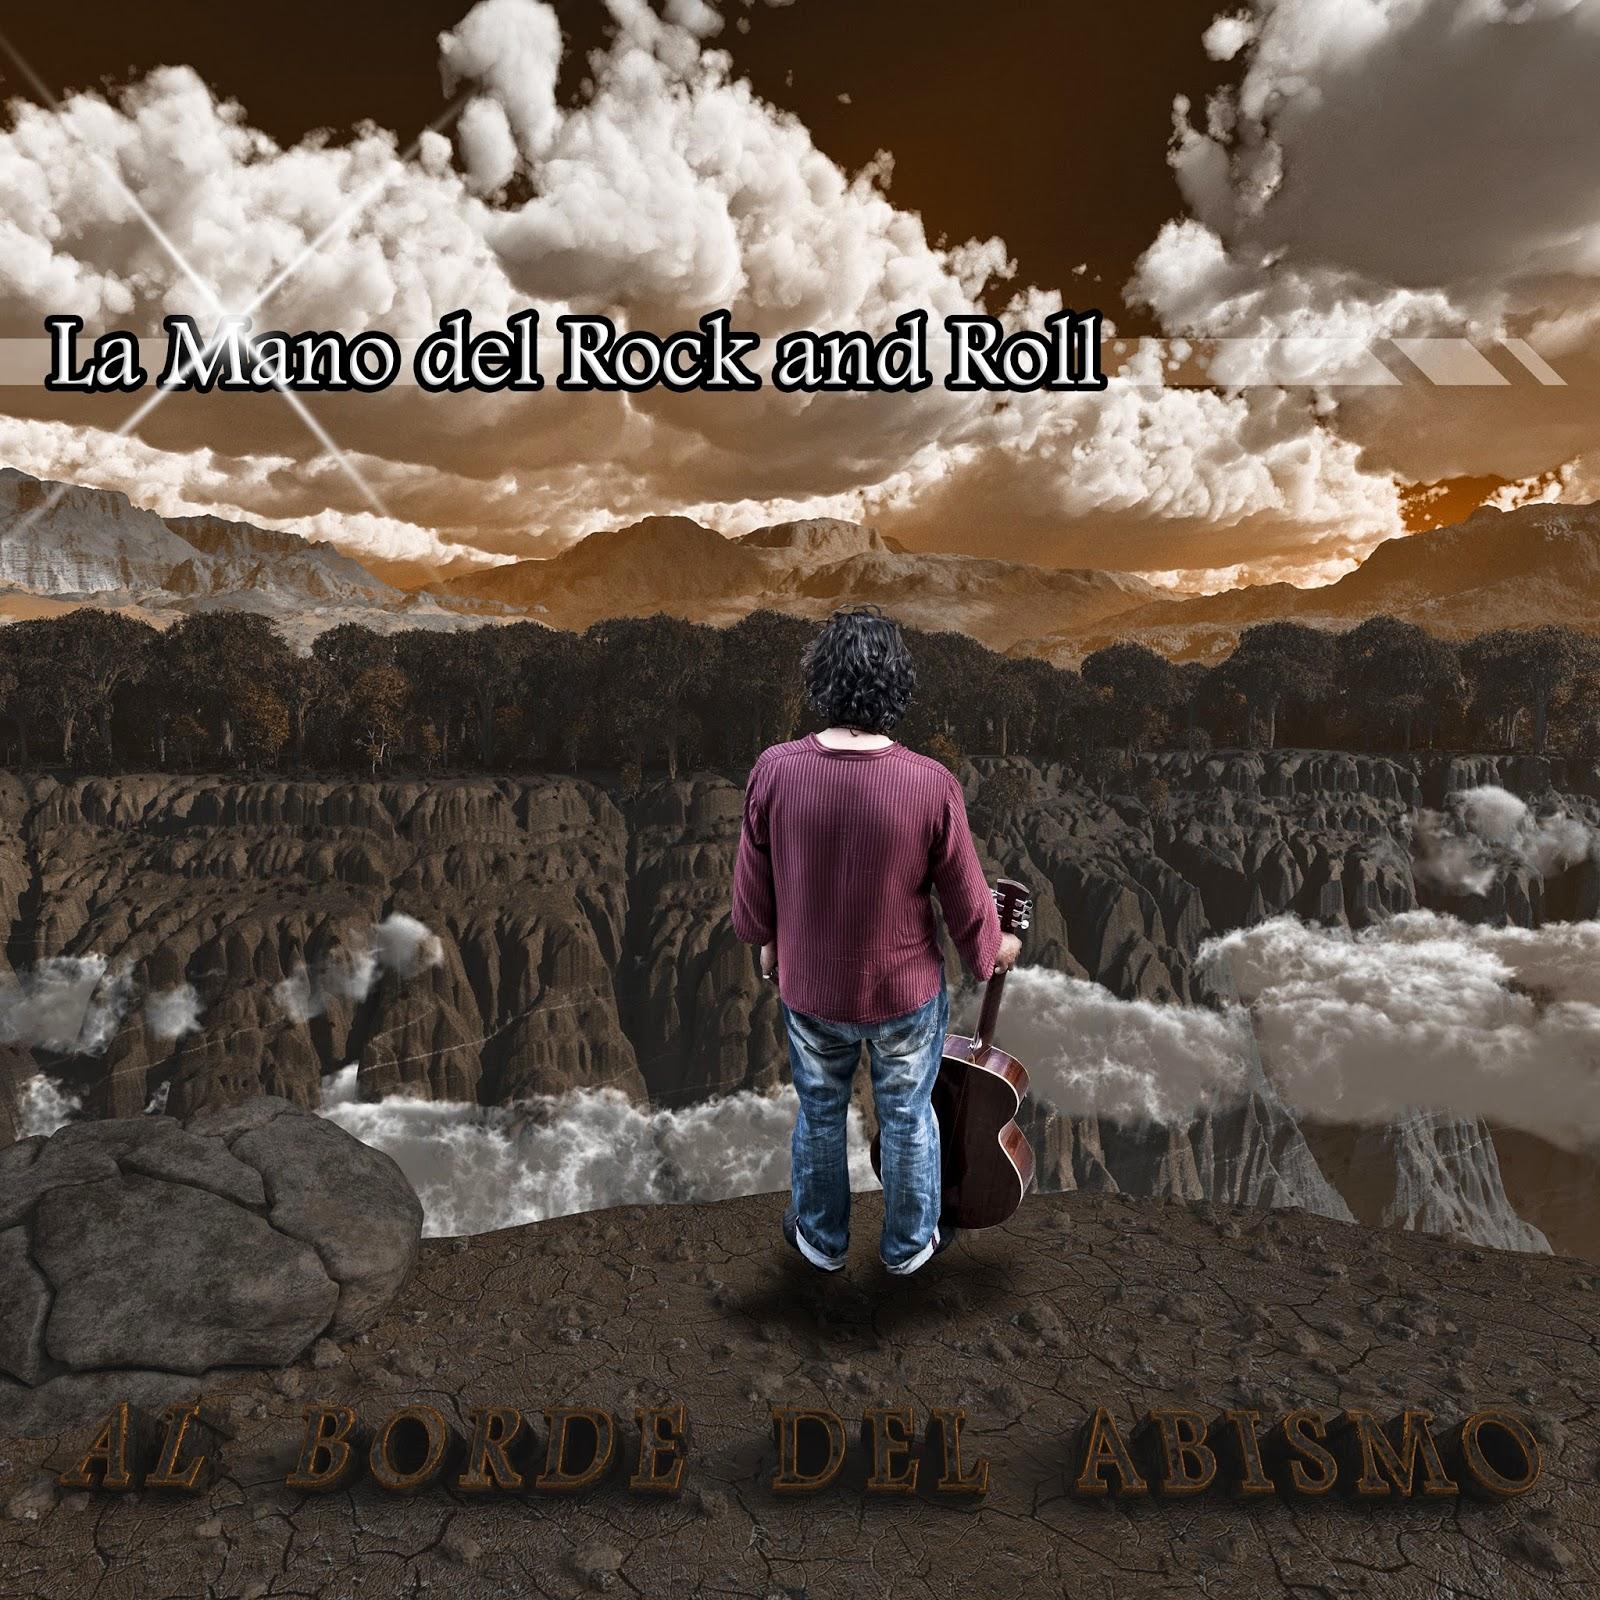 La mano del rock and roll al borde del abismo